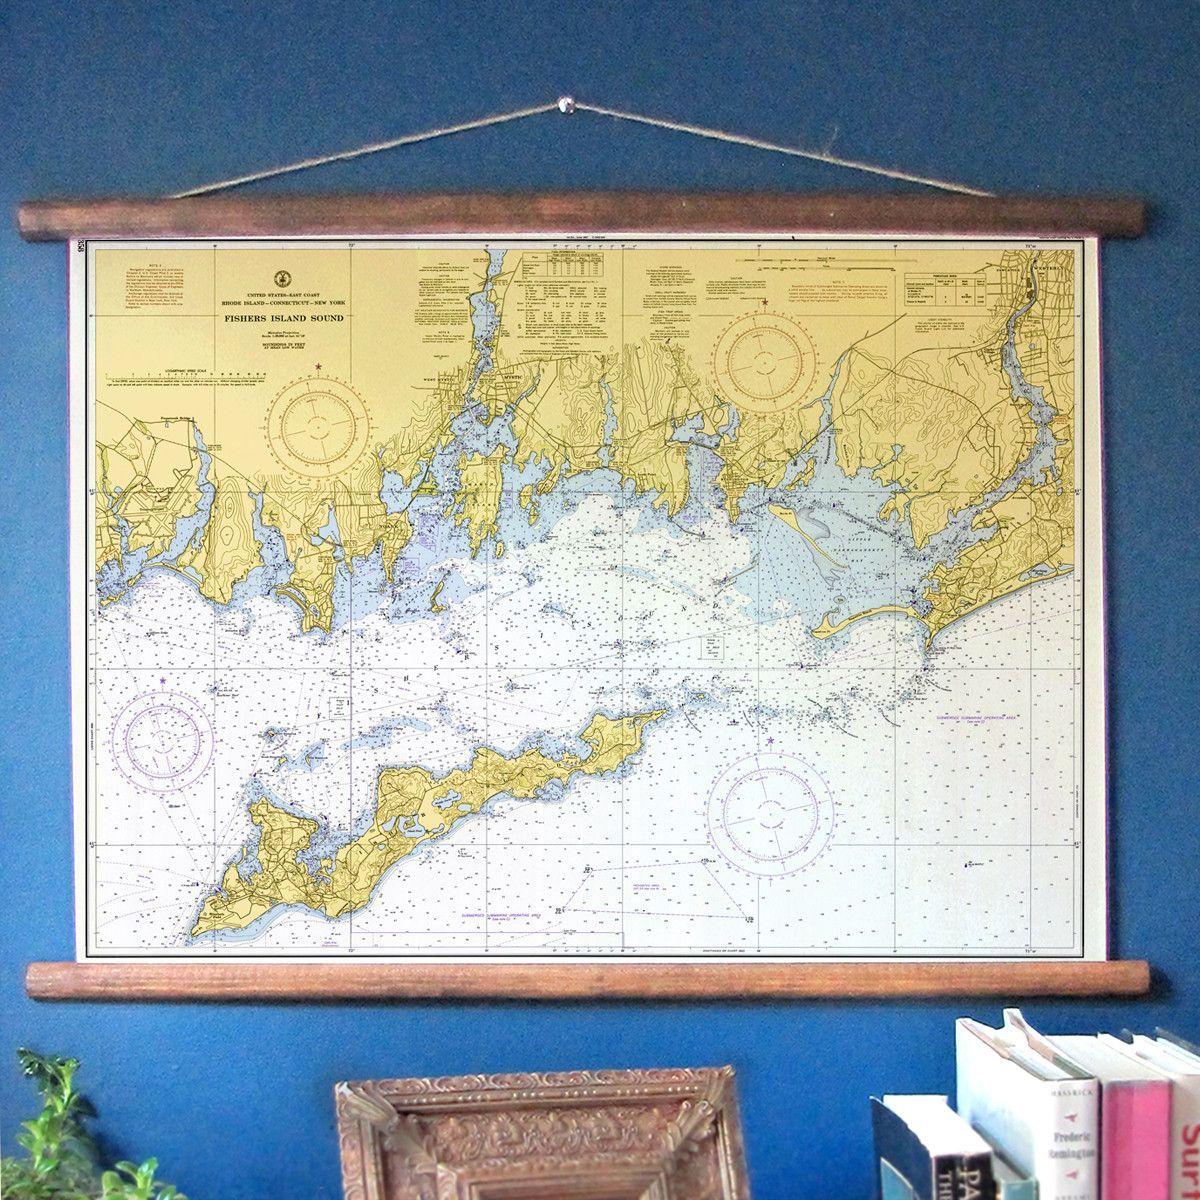 Mystic, CT & Fishers Island Vintage Nautical Chart